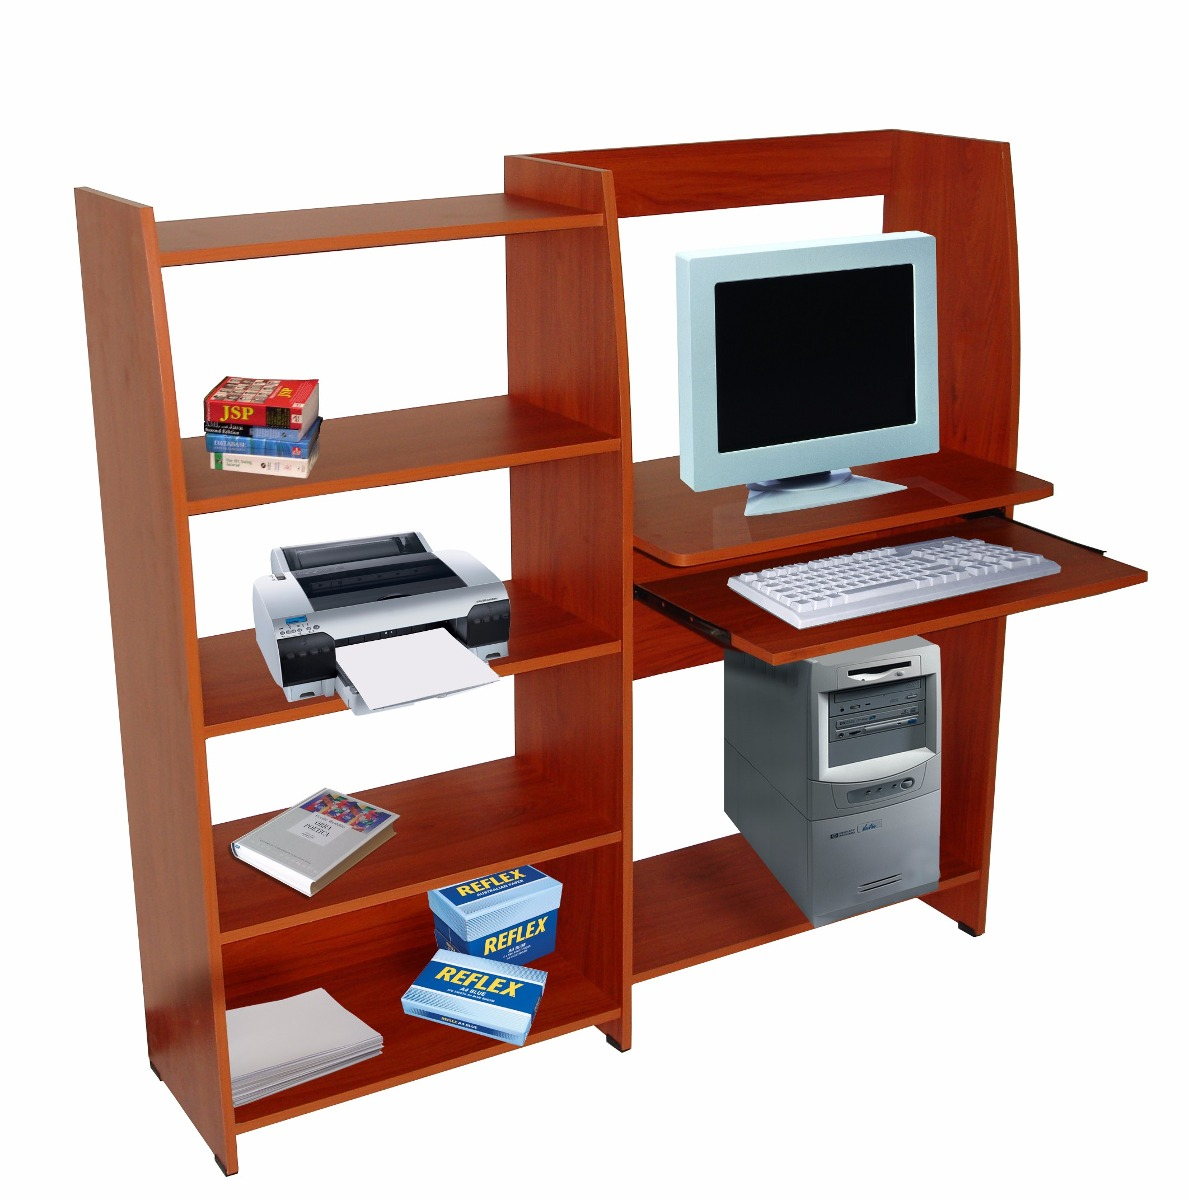 mueble para computadora madera excelente calidad bs 295